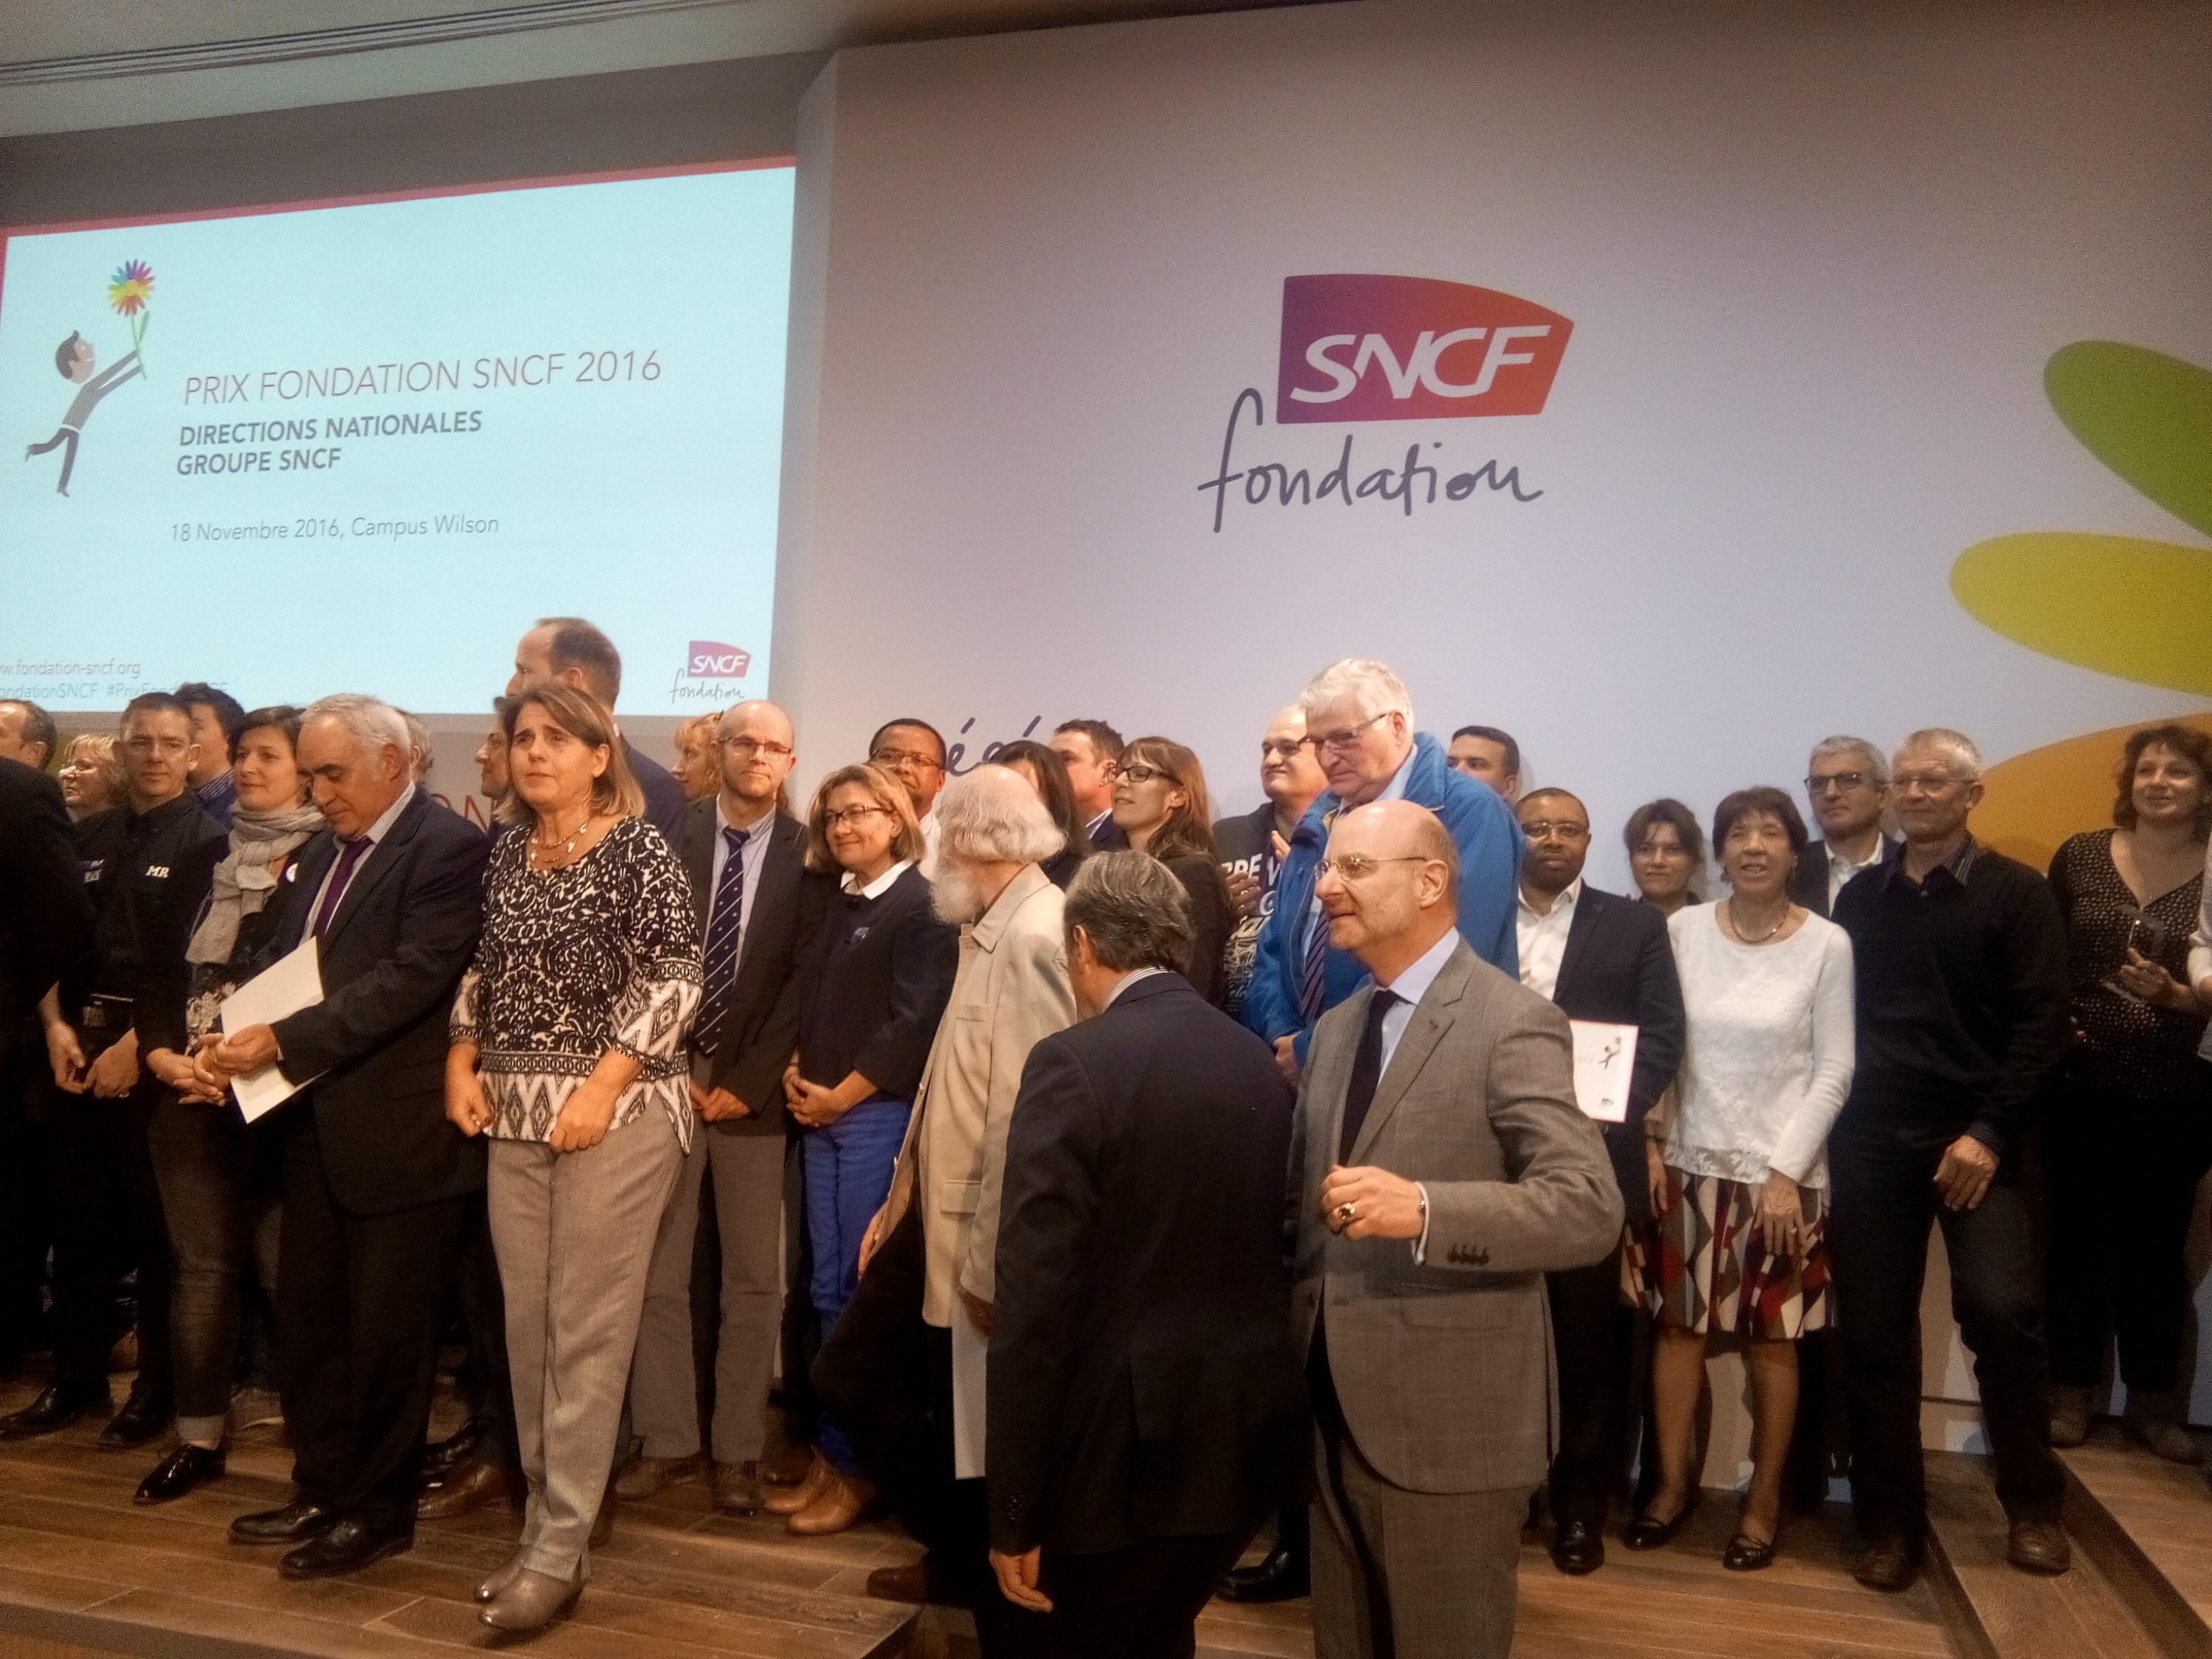 fondation-sncf-2016-11-remise-prix-2